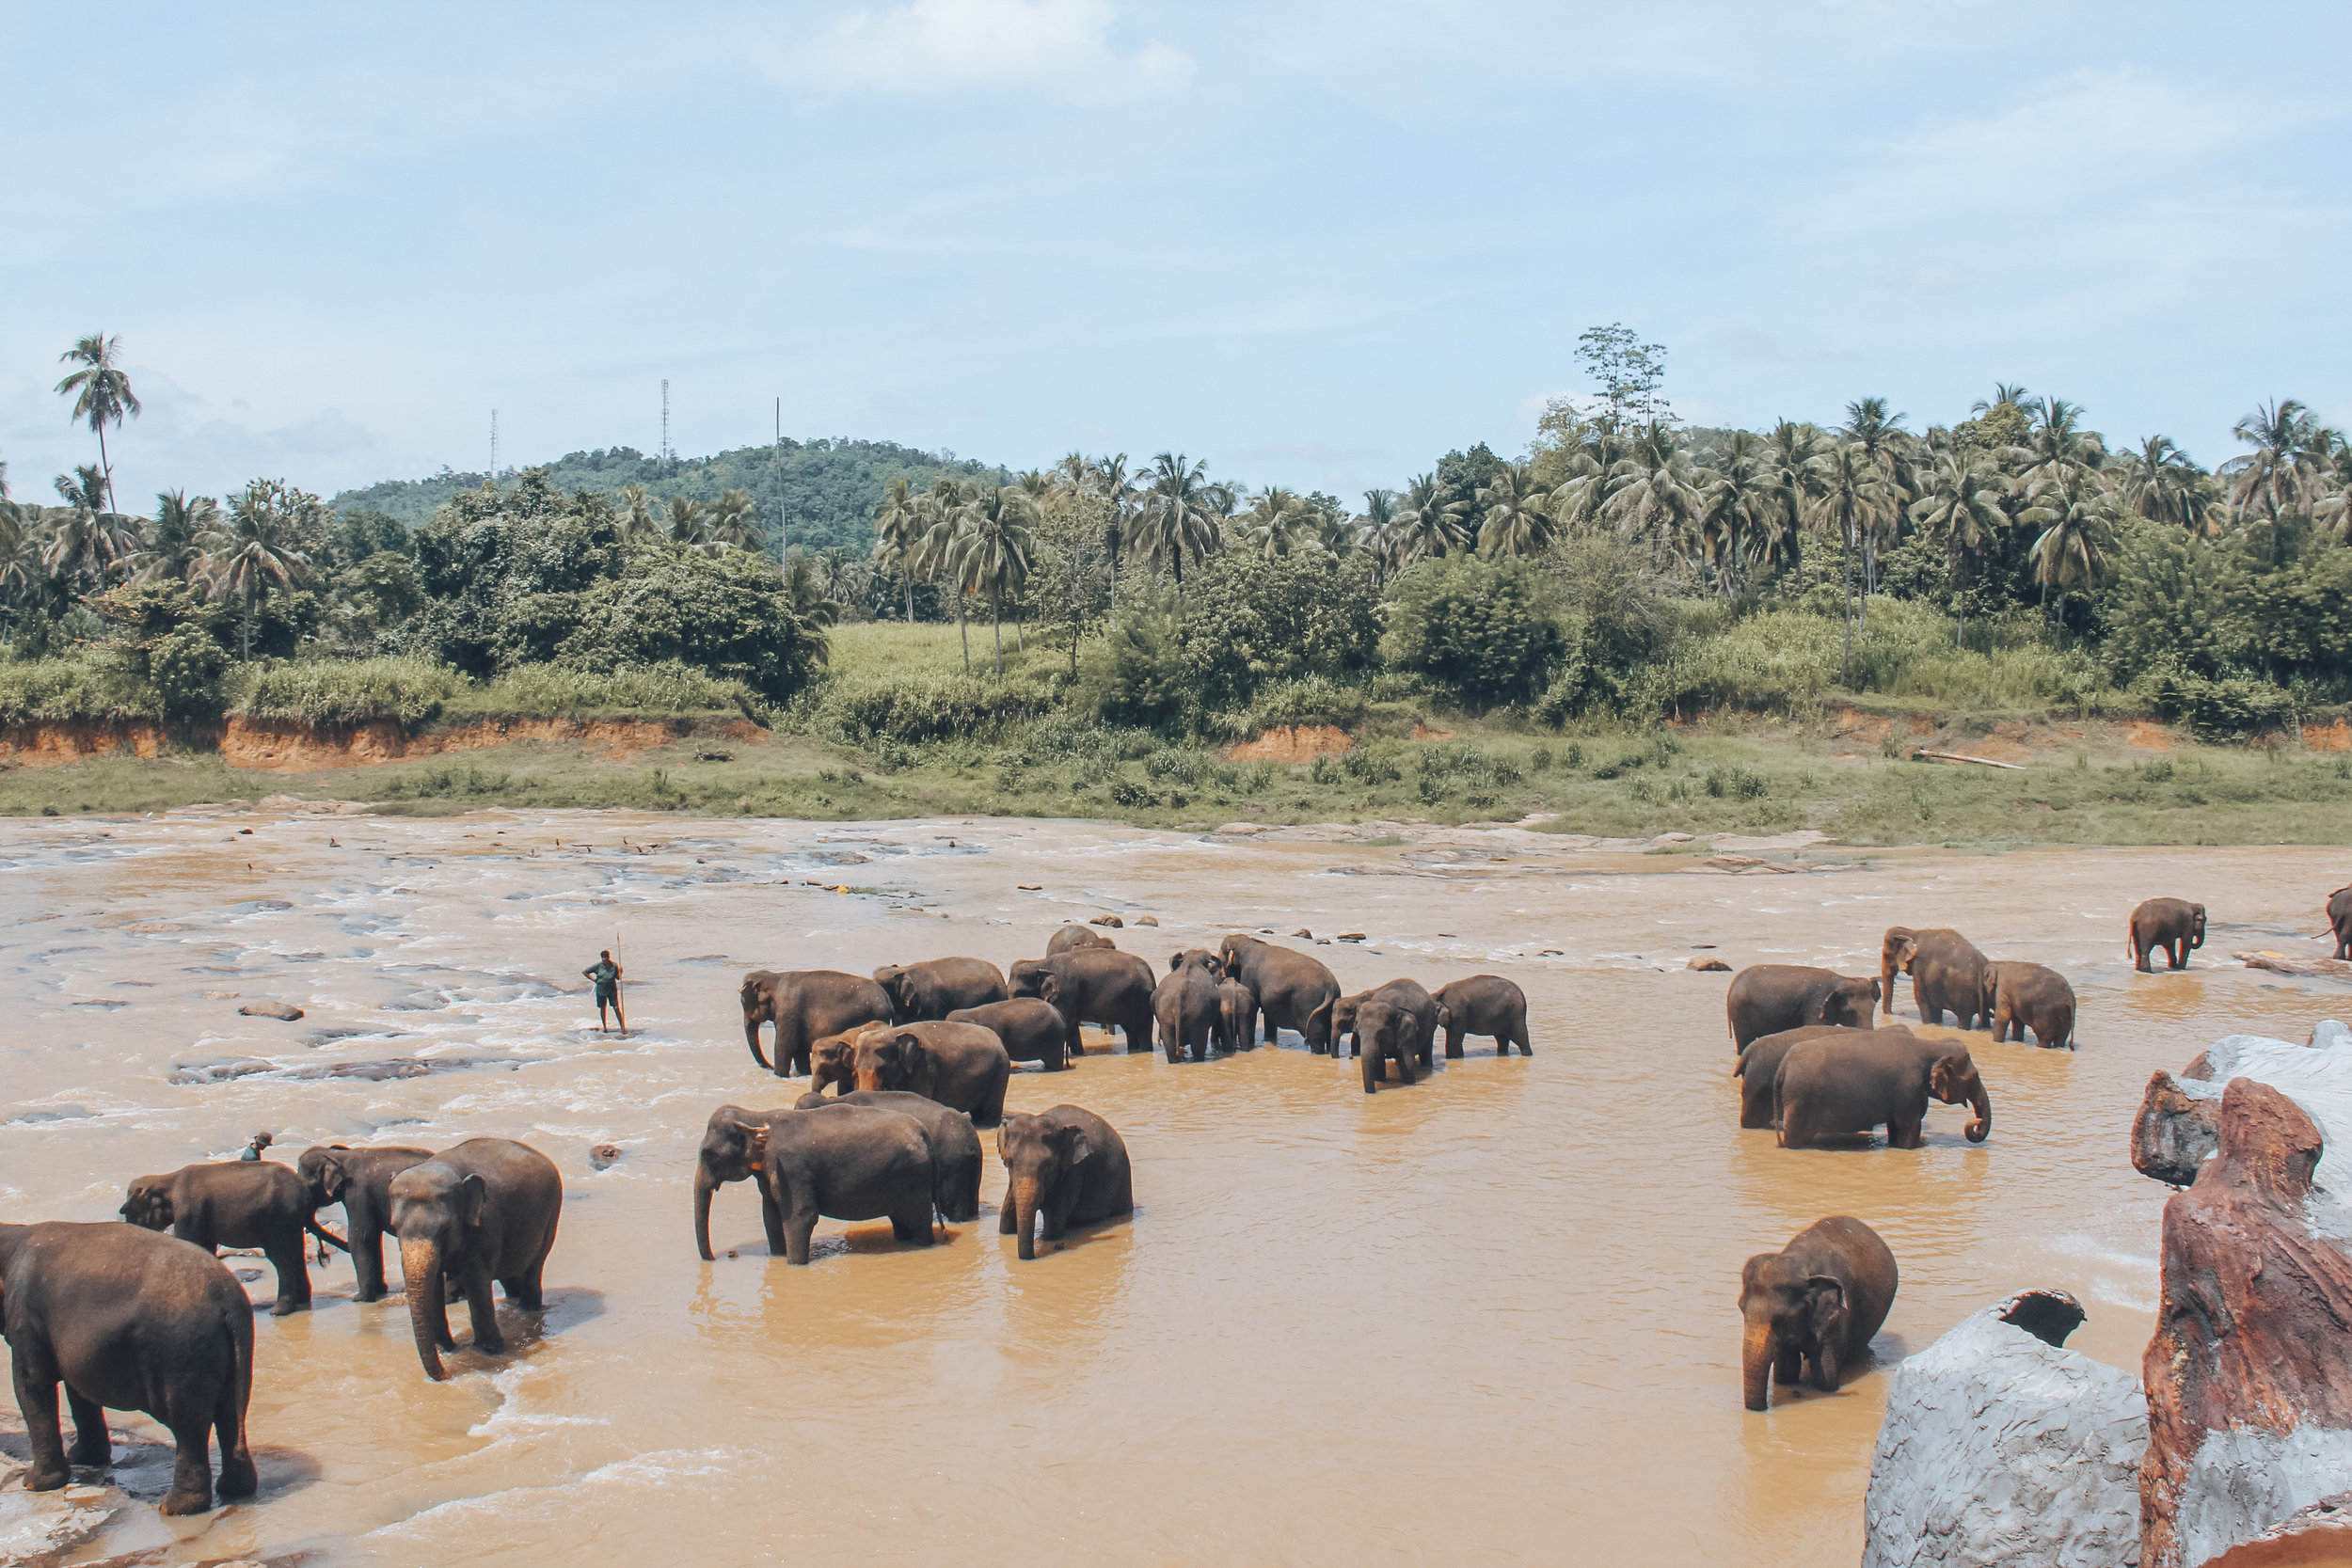 pinnawala - Elephant river bathing